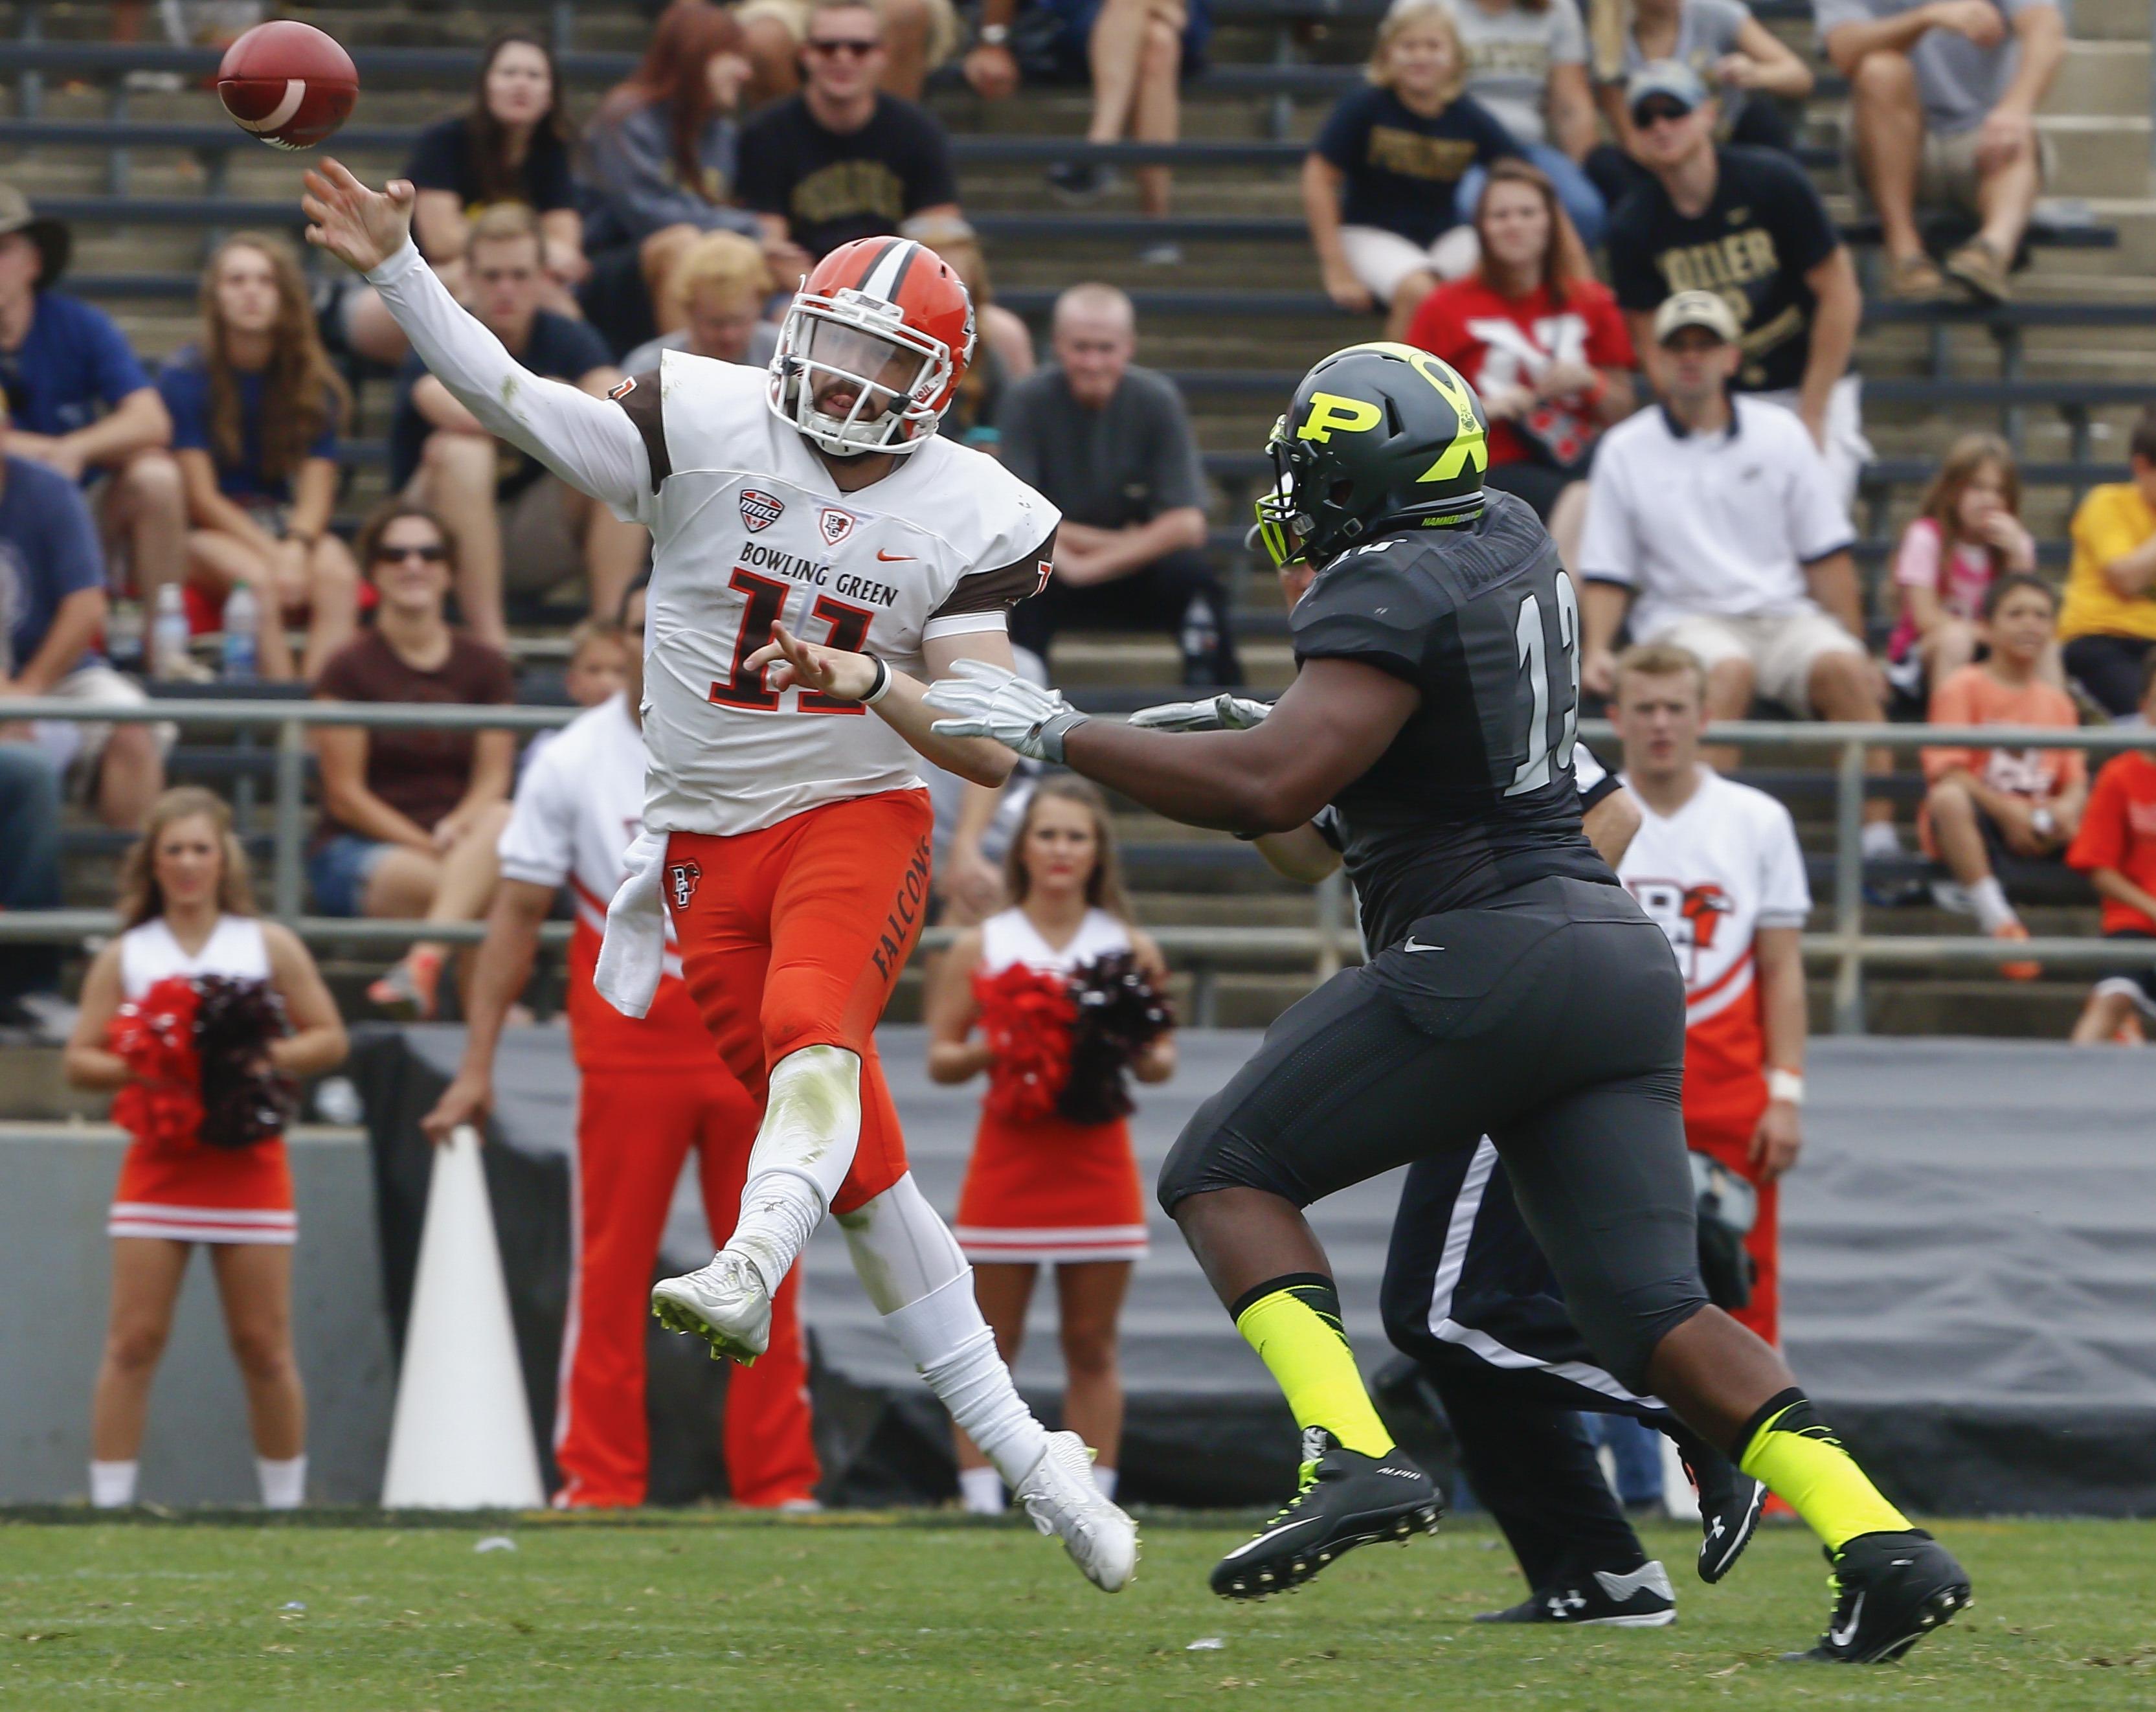 Bowling Green quarterback Matt Johnson has thrown for more than 400 yards in all four games this season.